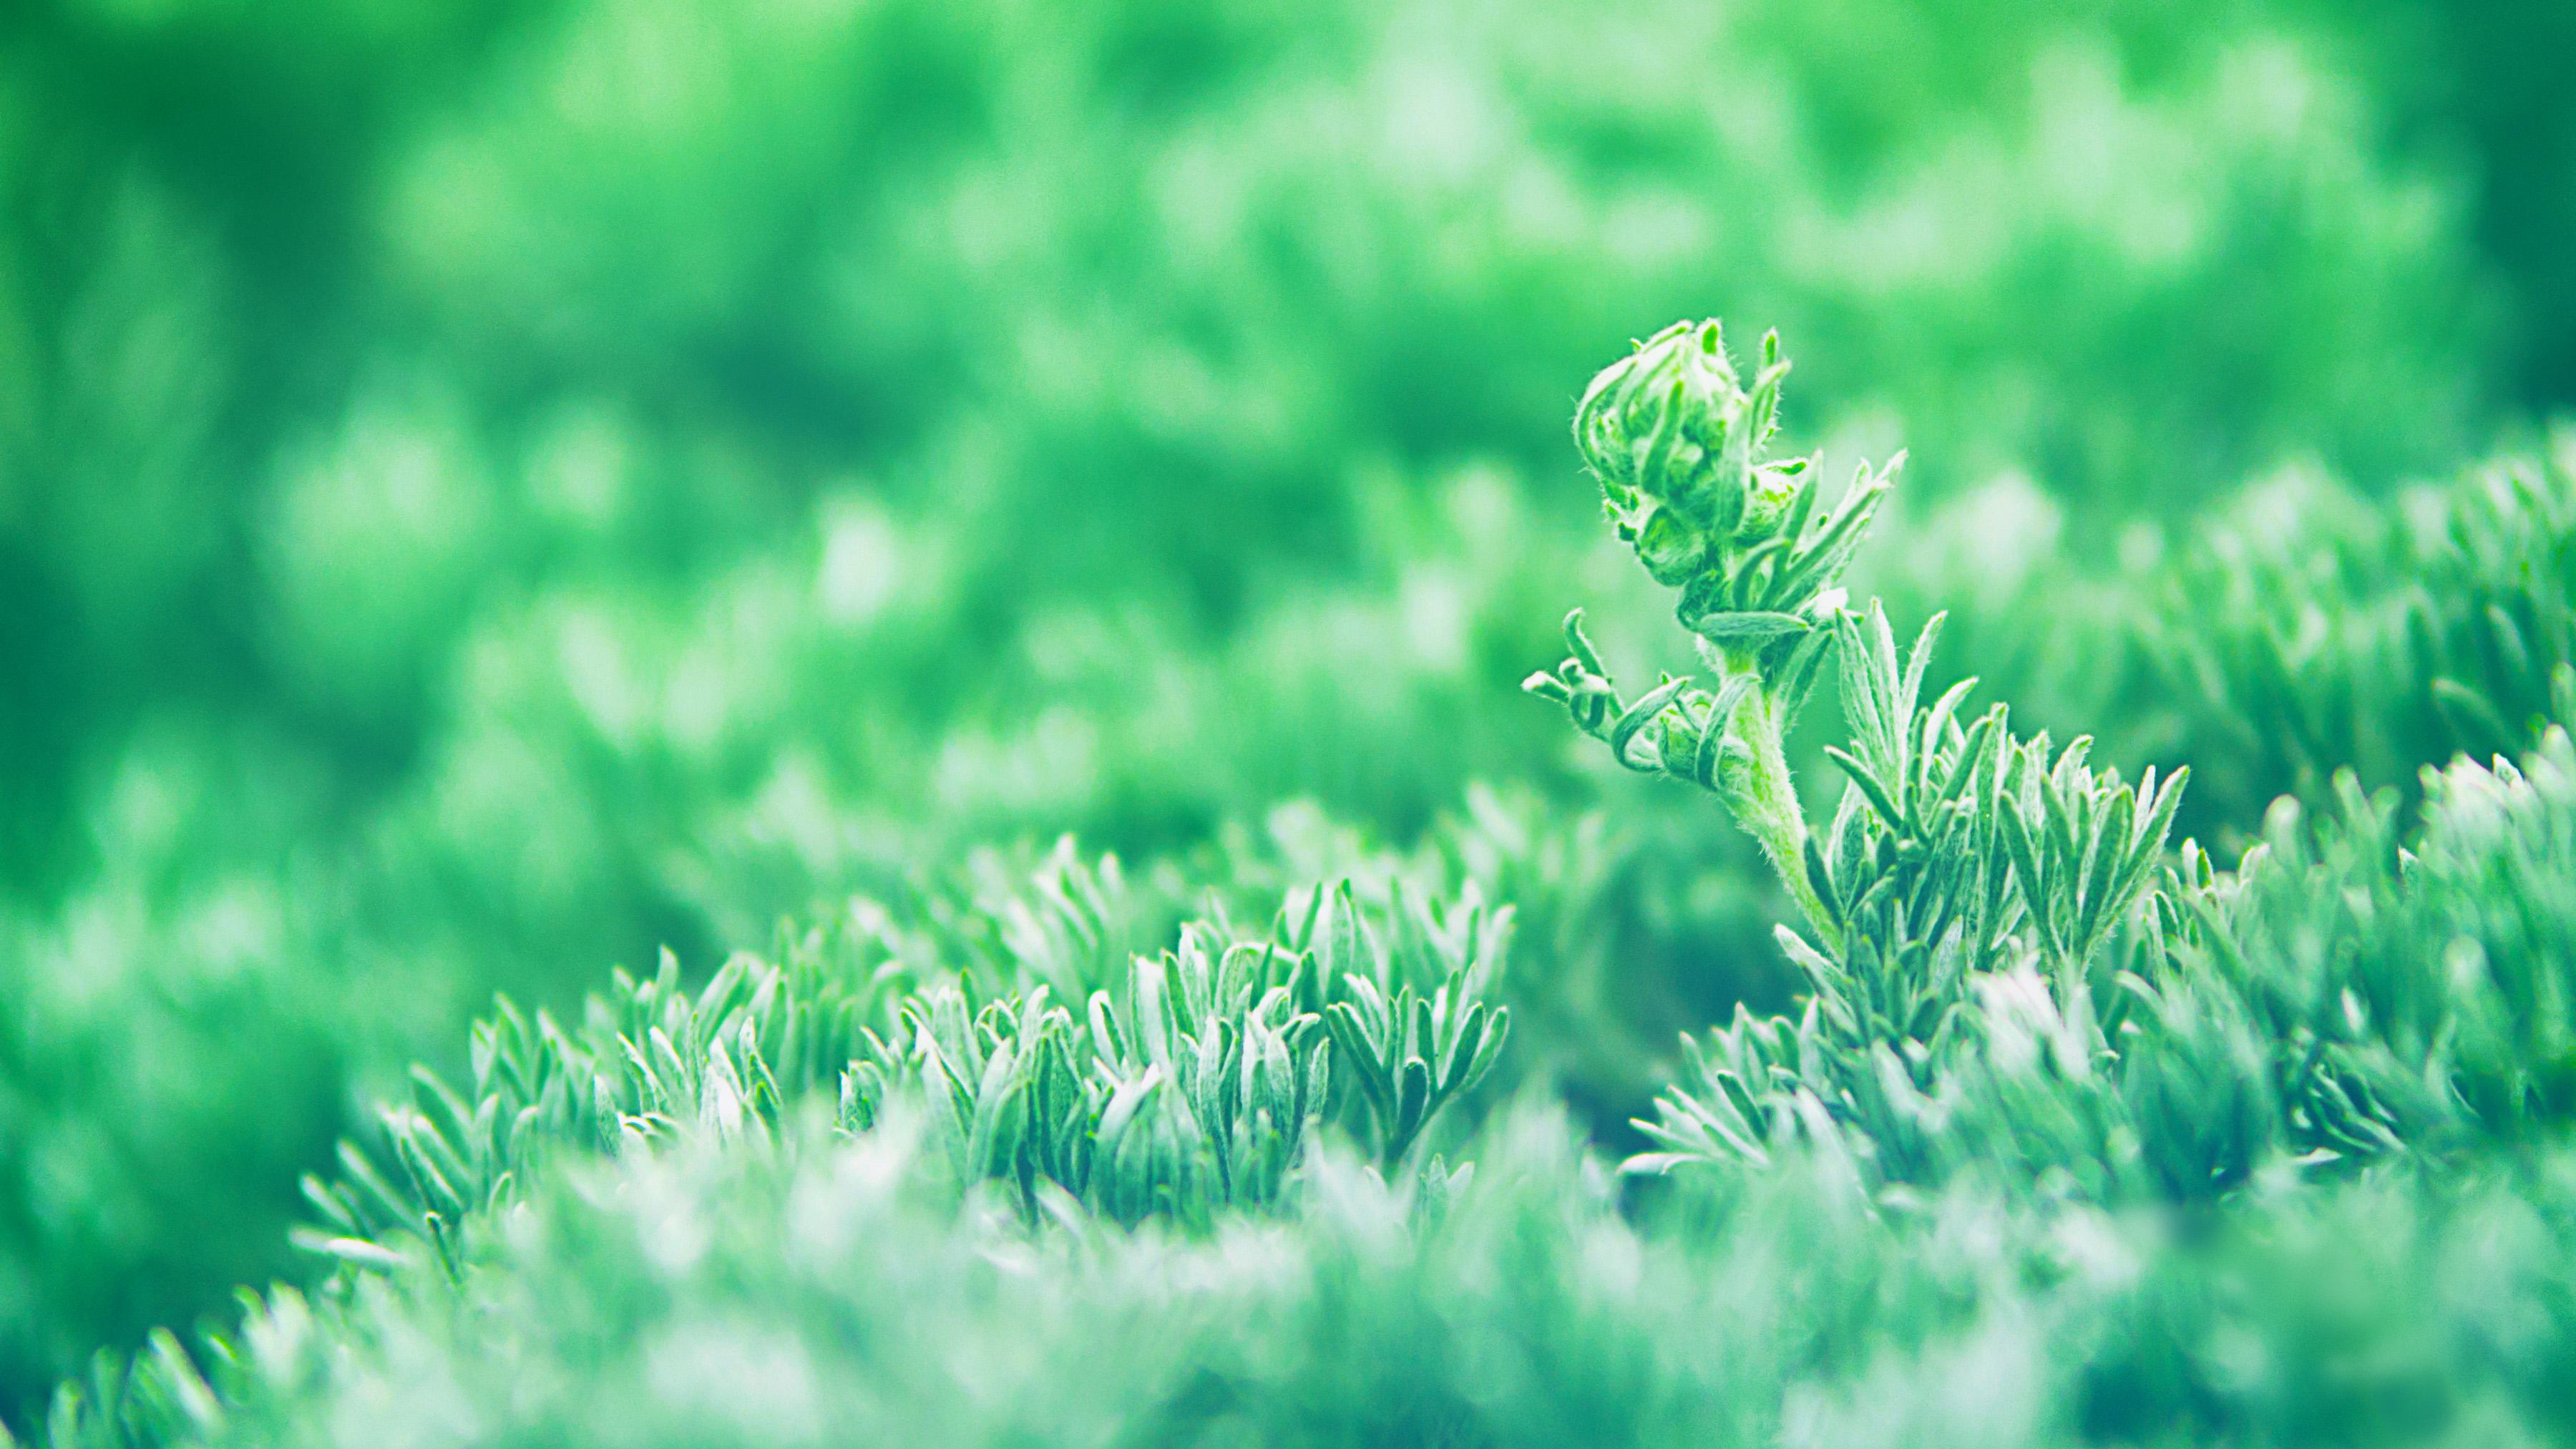 nature wallpaper,green,nature,grass,vegetation,natural landscape